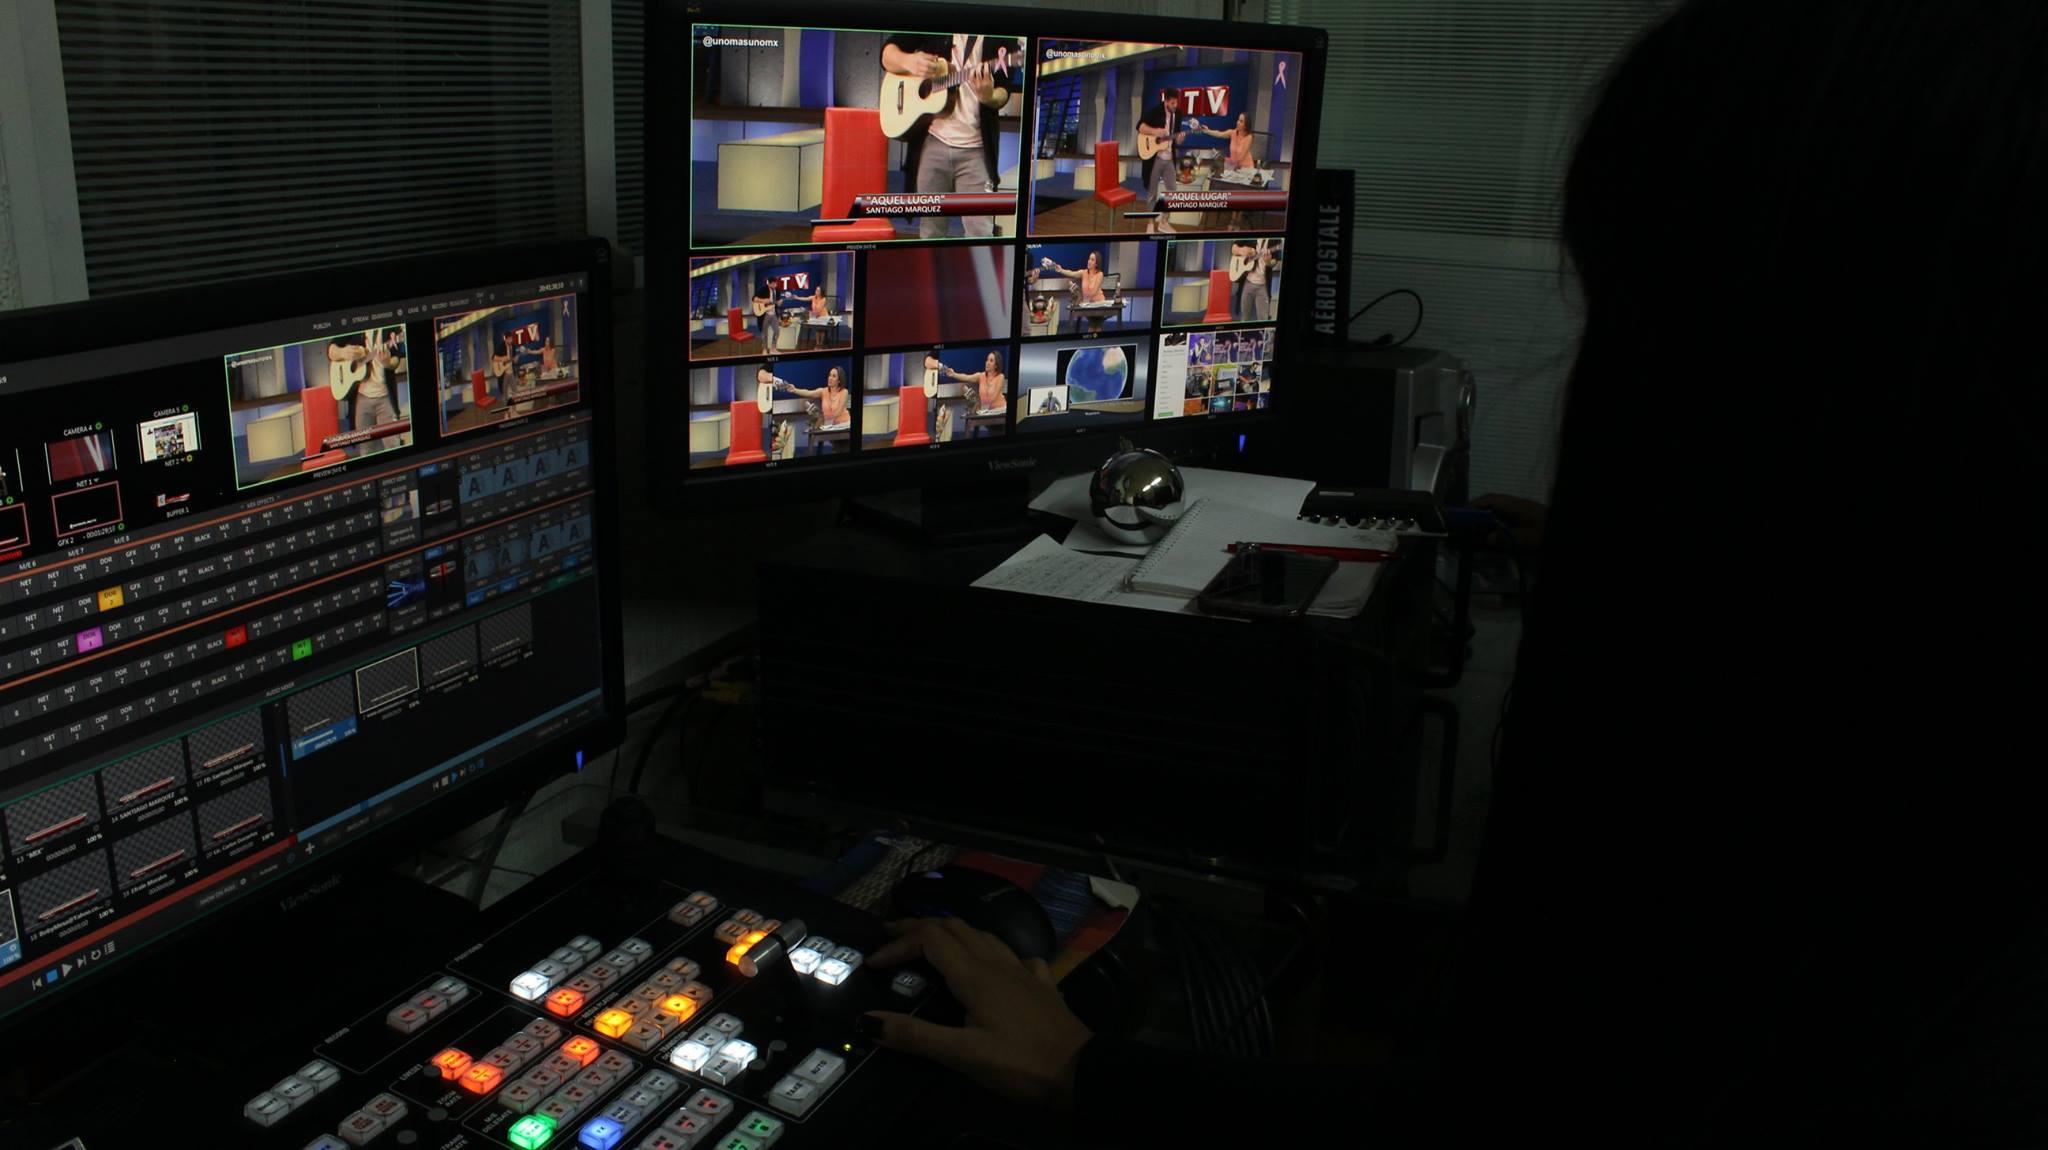 Tour de medios Santiago Marquez